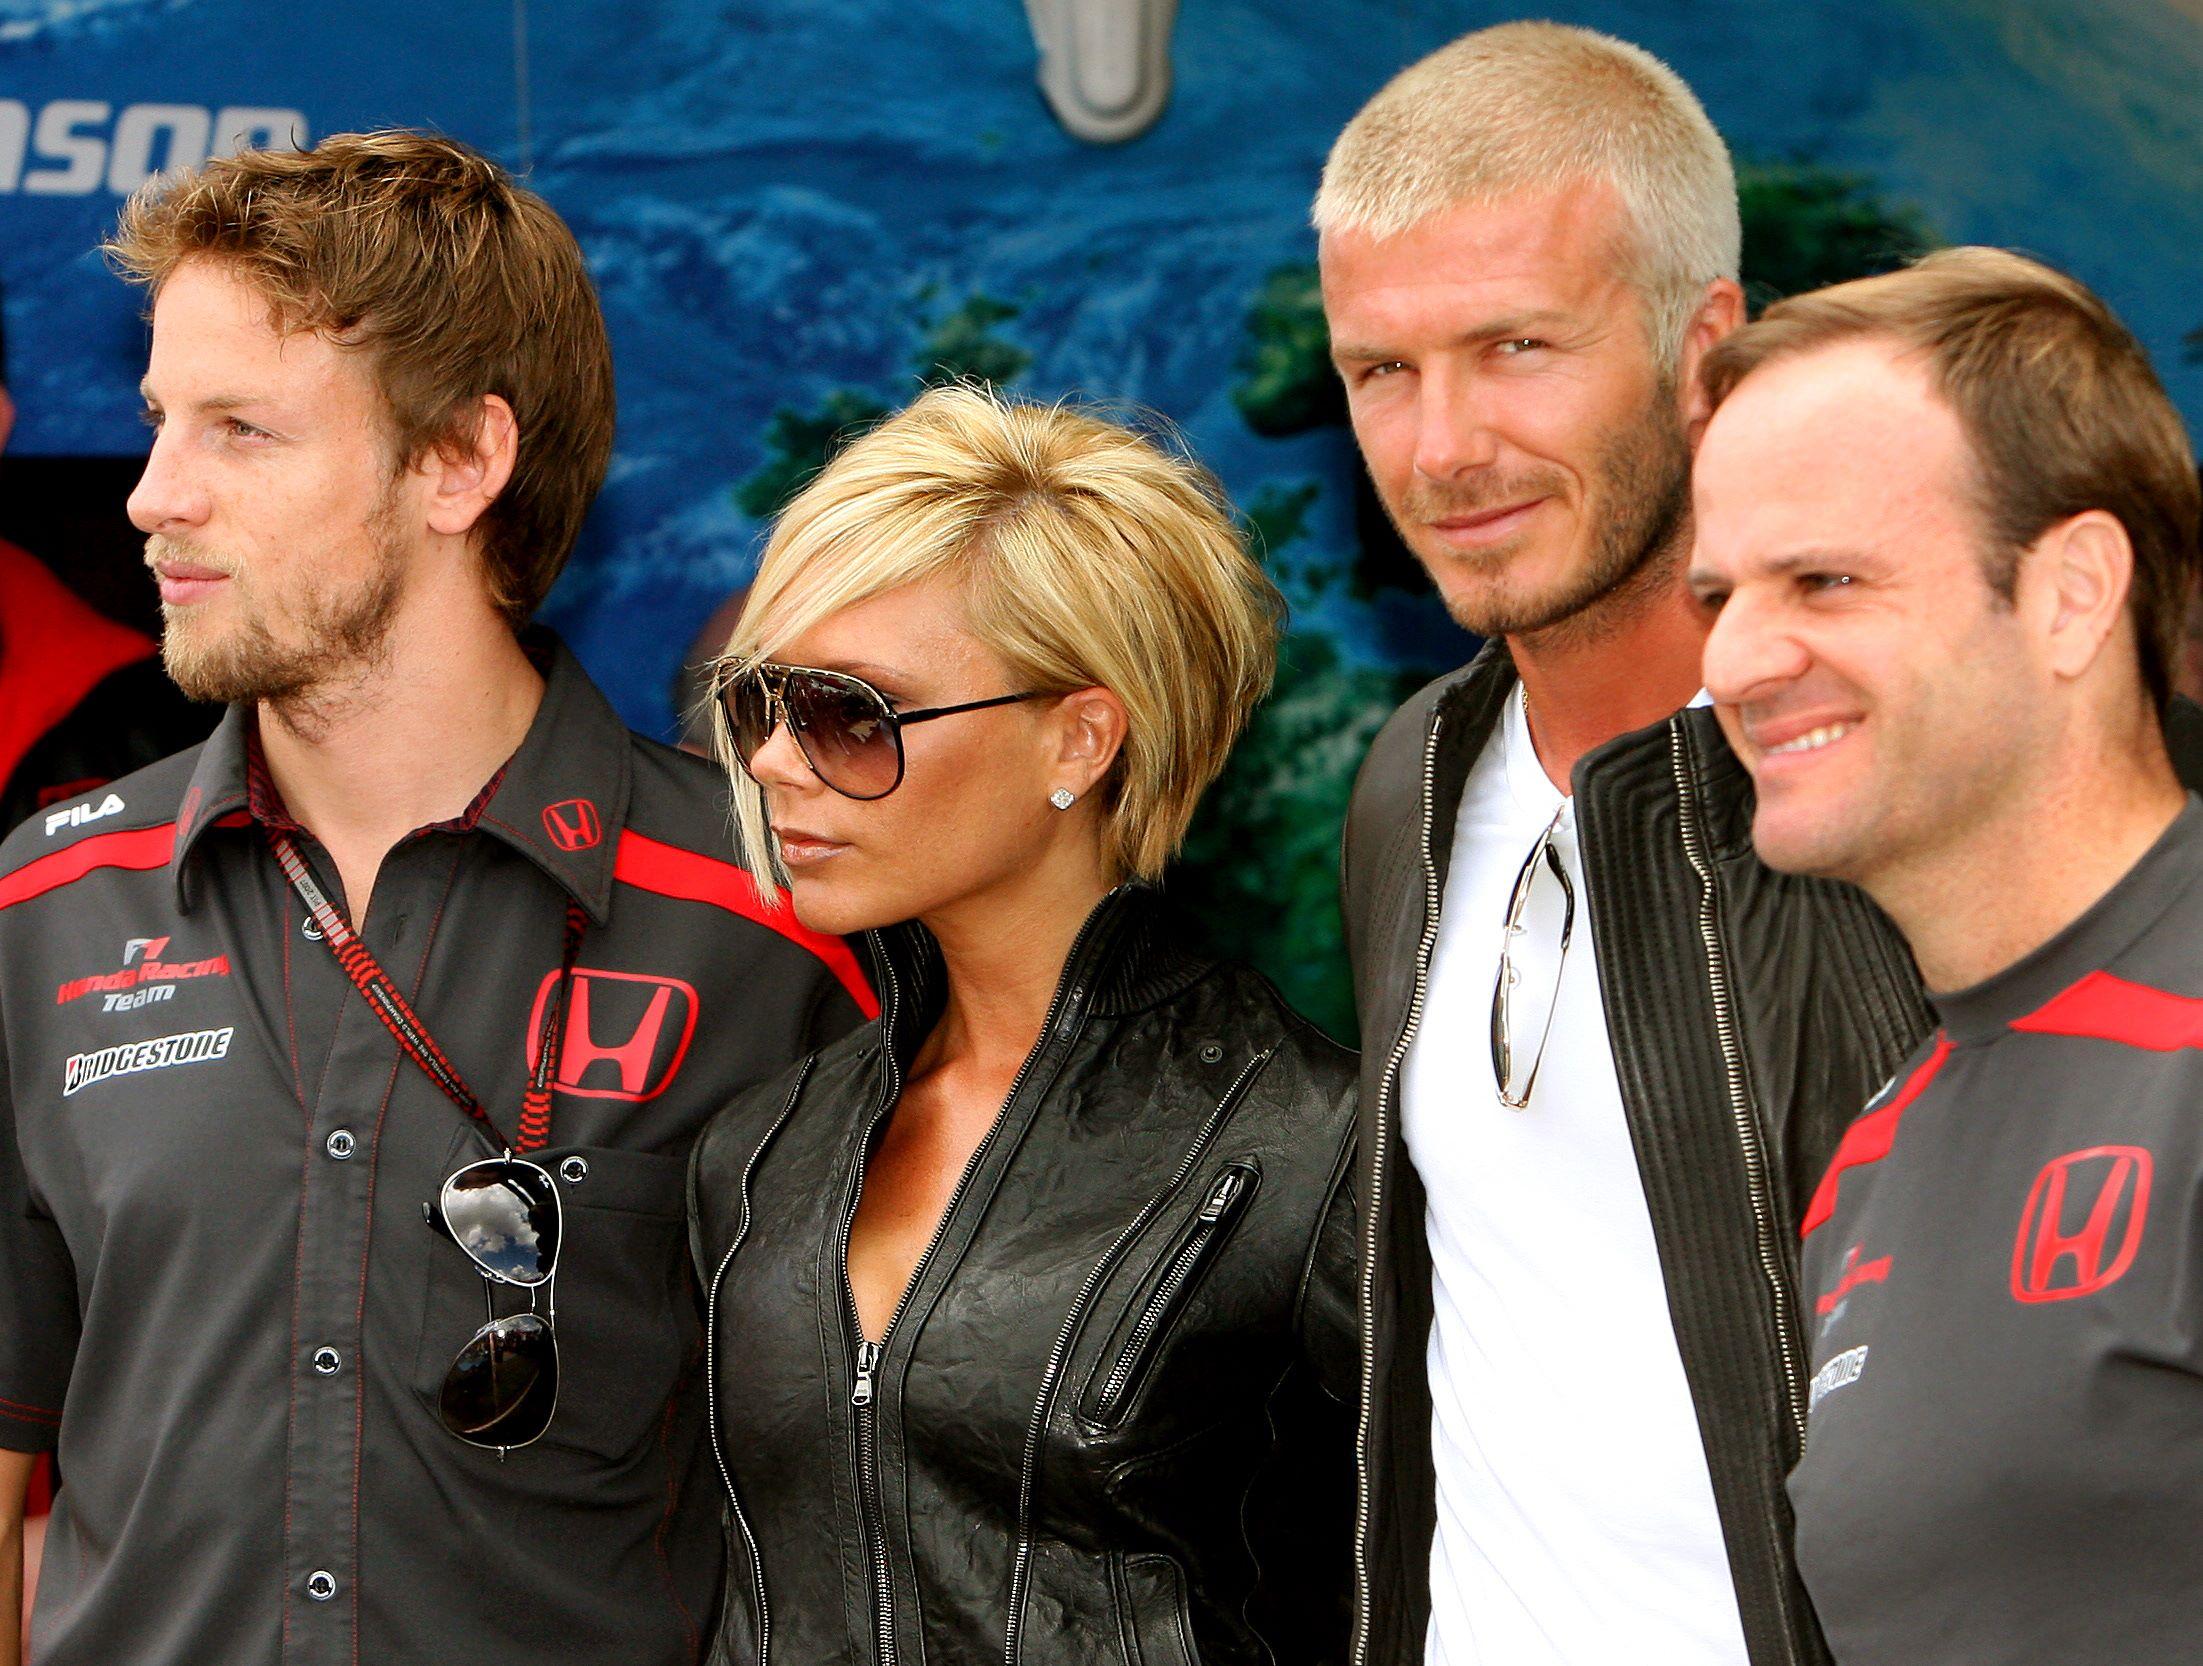 97506_celeb-city.eu_Victoria_Beckham_Formula_One_Grand_Prix_at_Silverstone_040_123_656lo.jpg